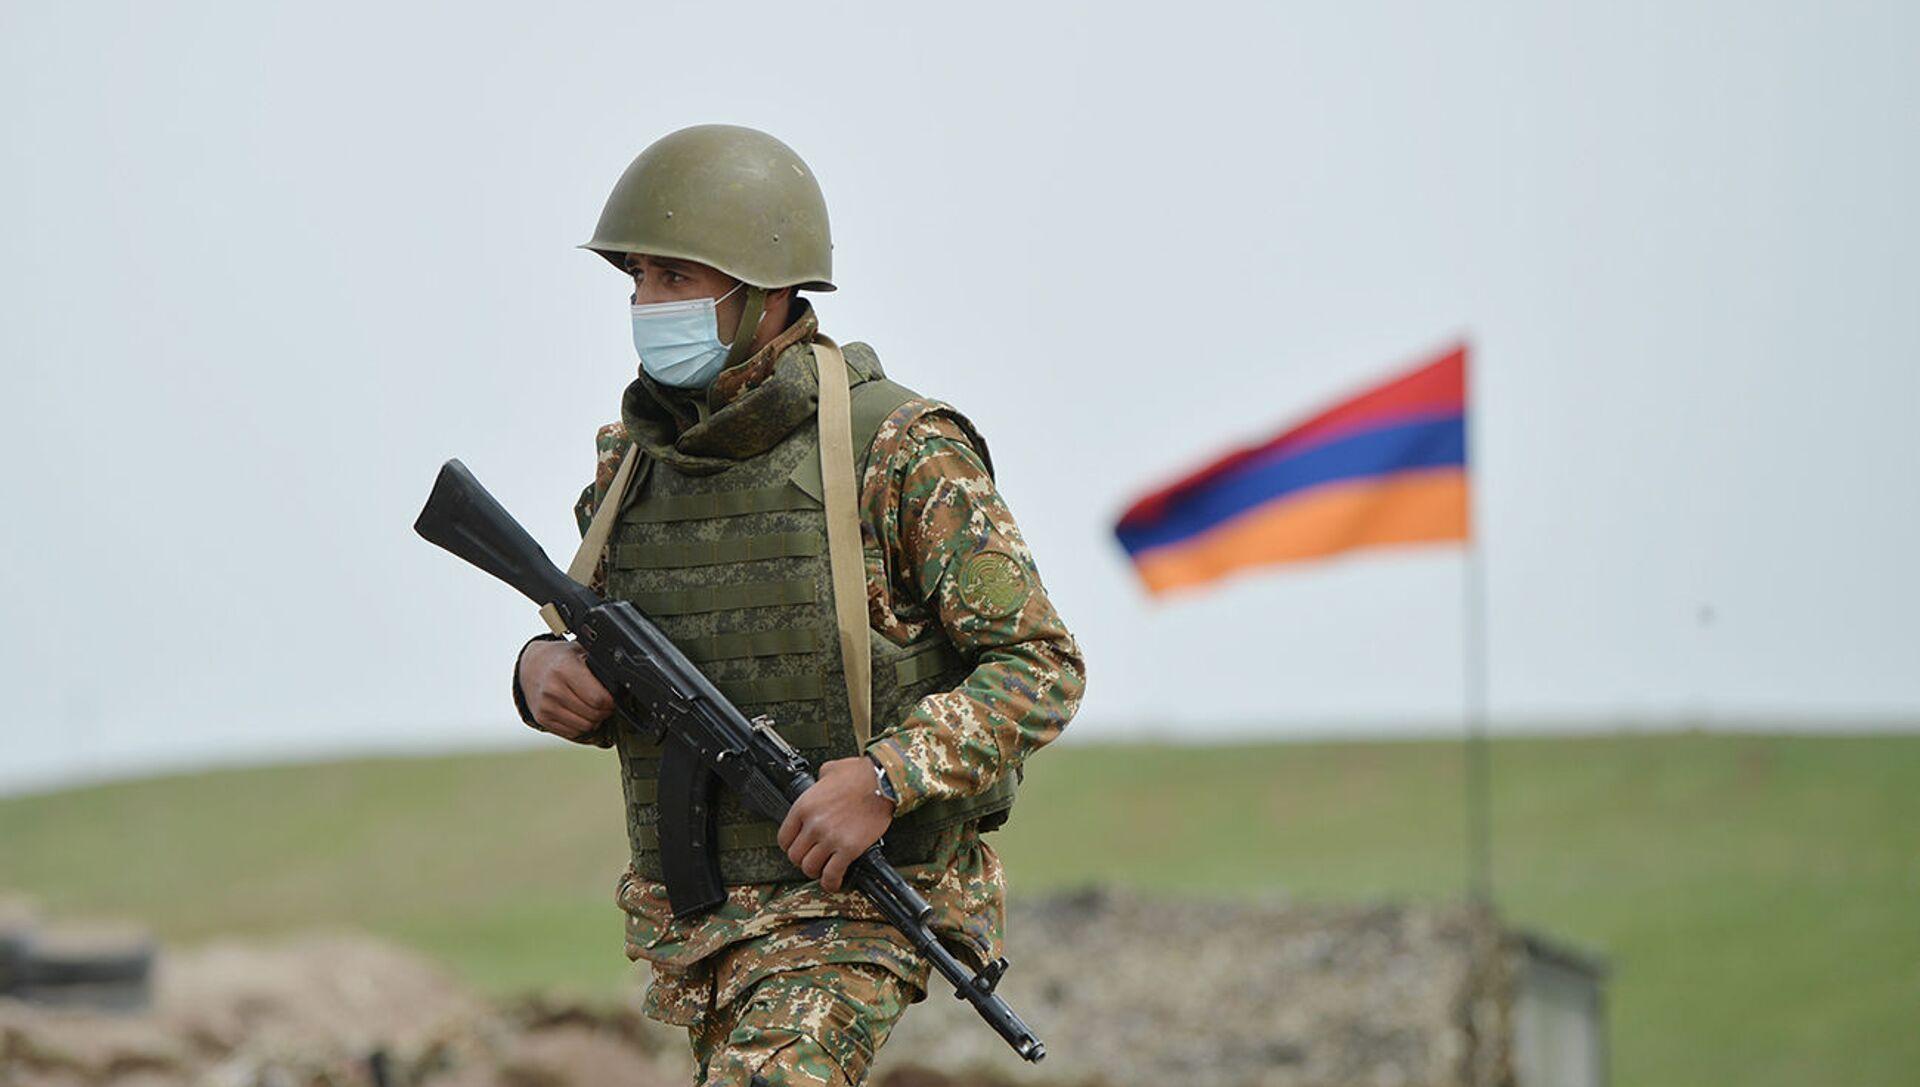 Армянский военнослужащий на армяно-азербайджанской границе - Sputnik Արմենիա, 1920, 20.05.2021